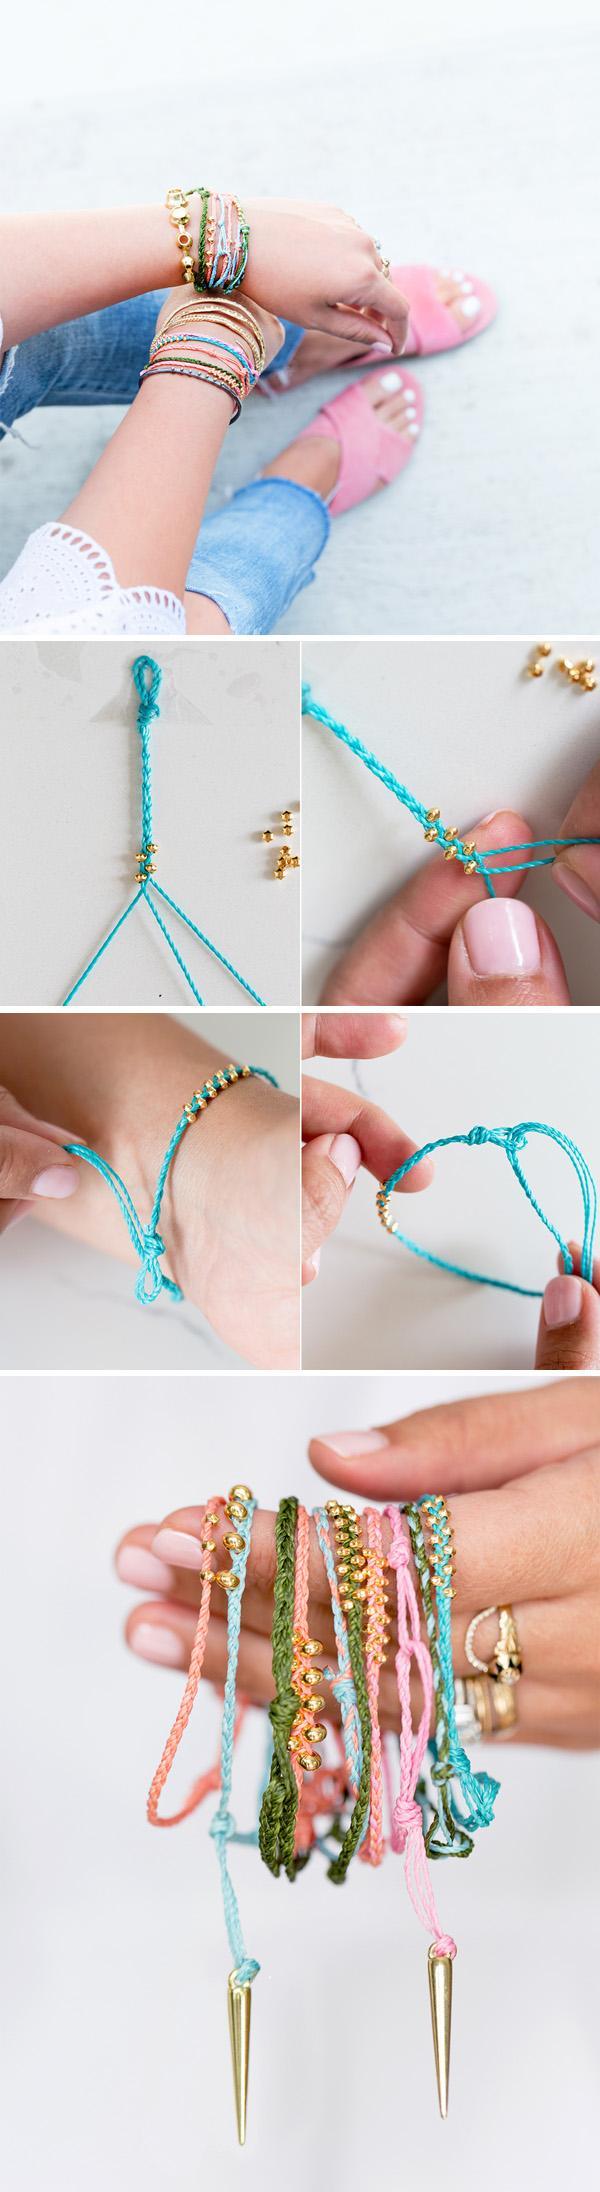 braided bracelets-3